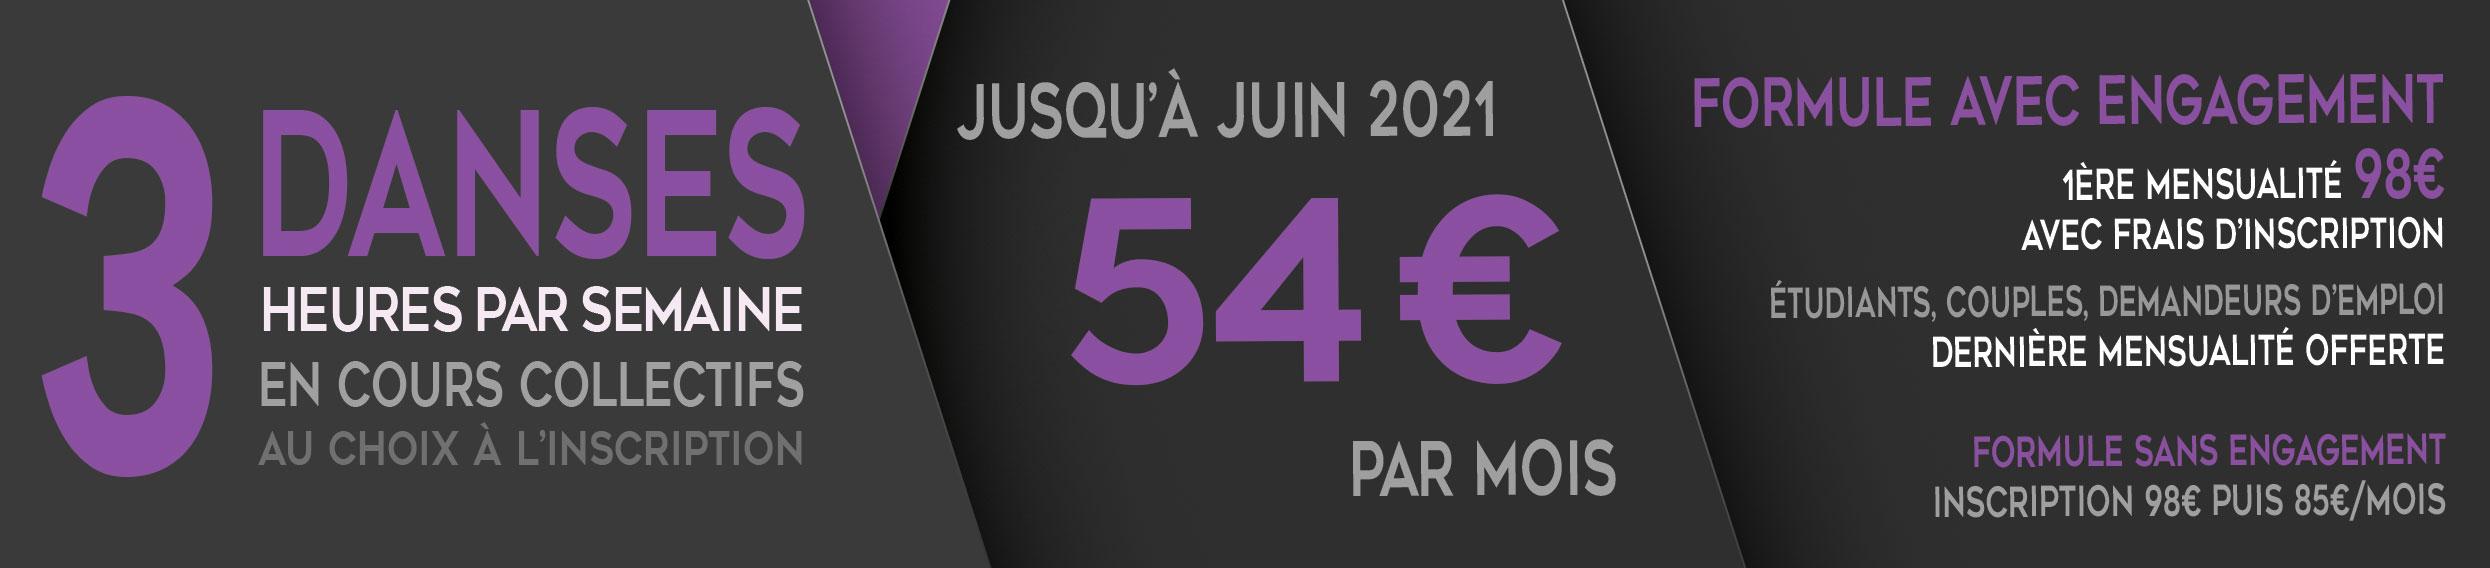 Tarif-3-Cours-Hebdo